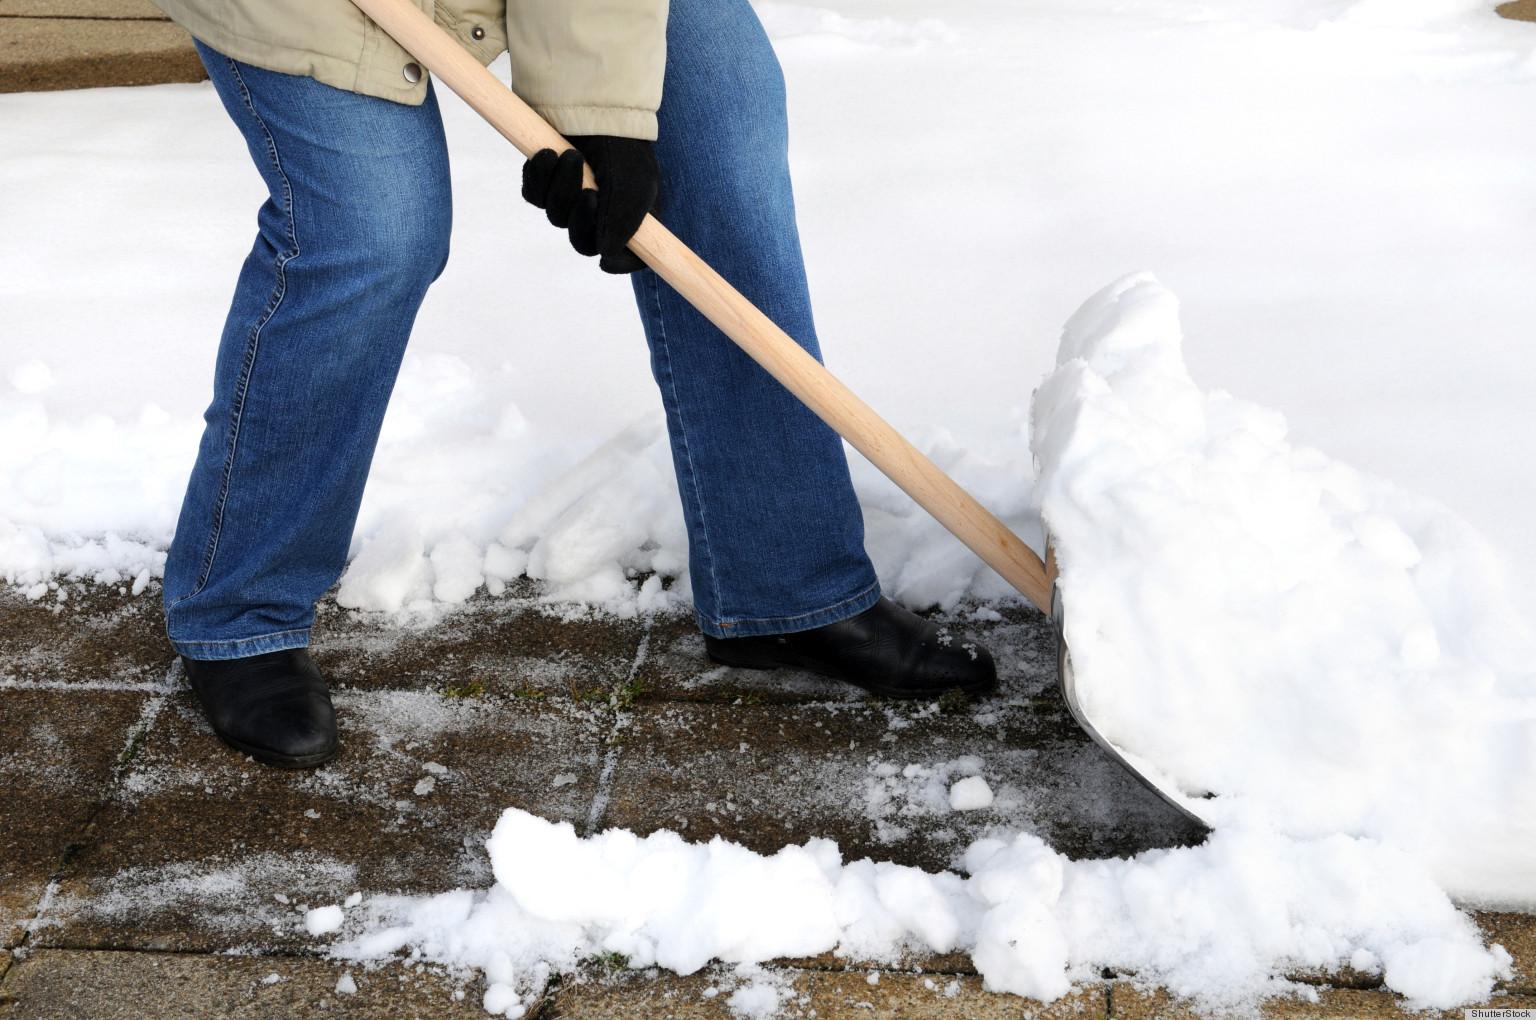 o-EASIEST-WAY-TO-SHOVEL-SNOW-facebook